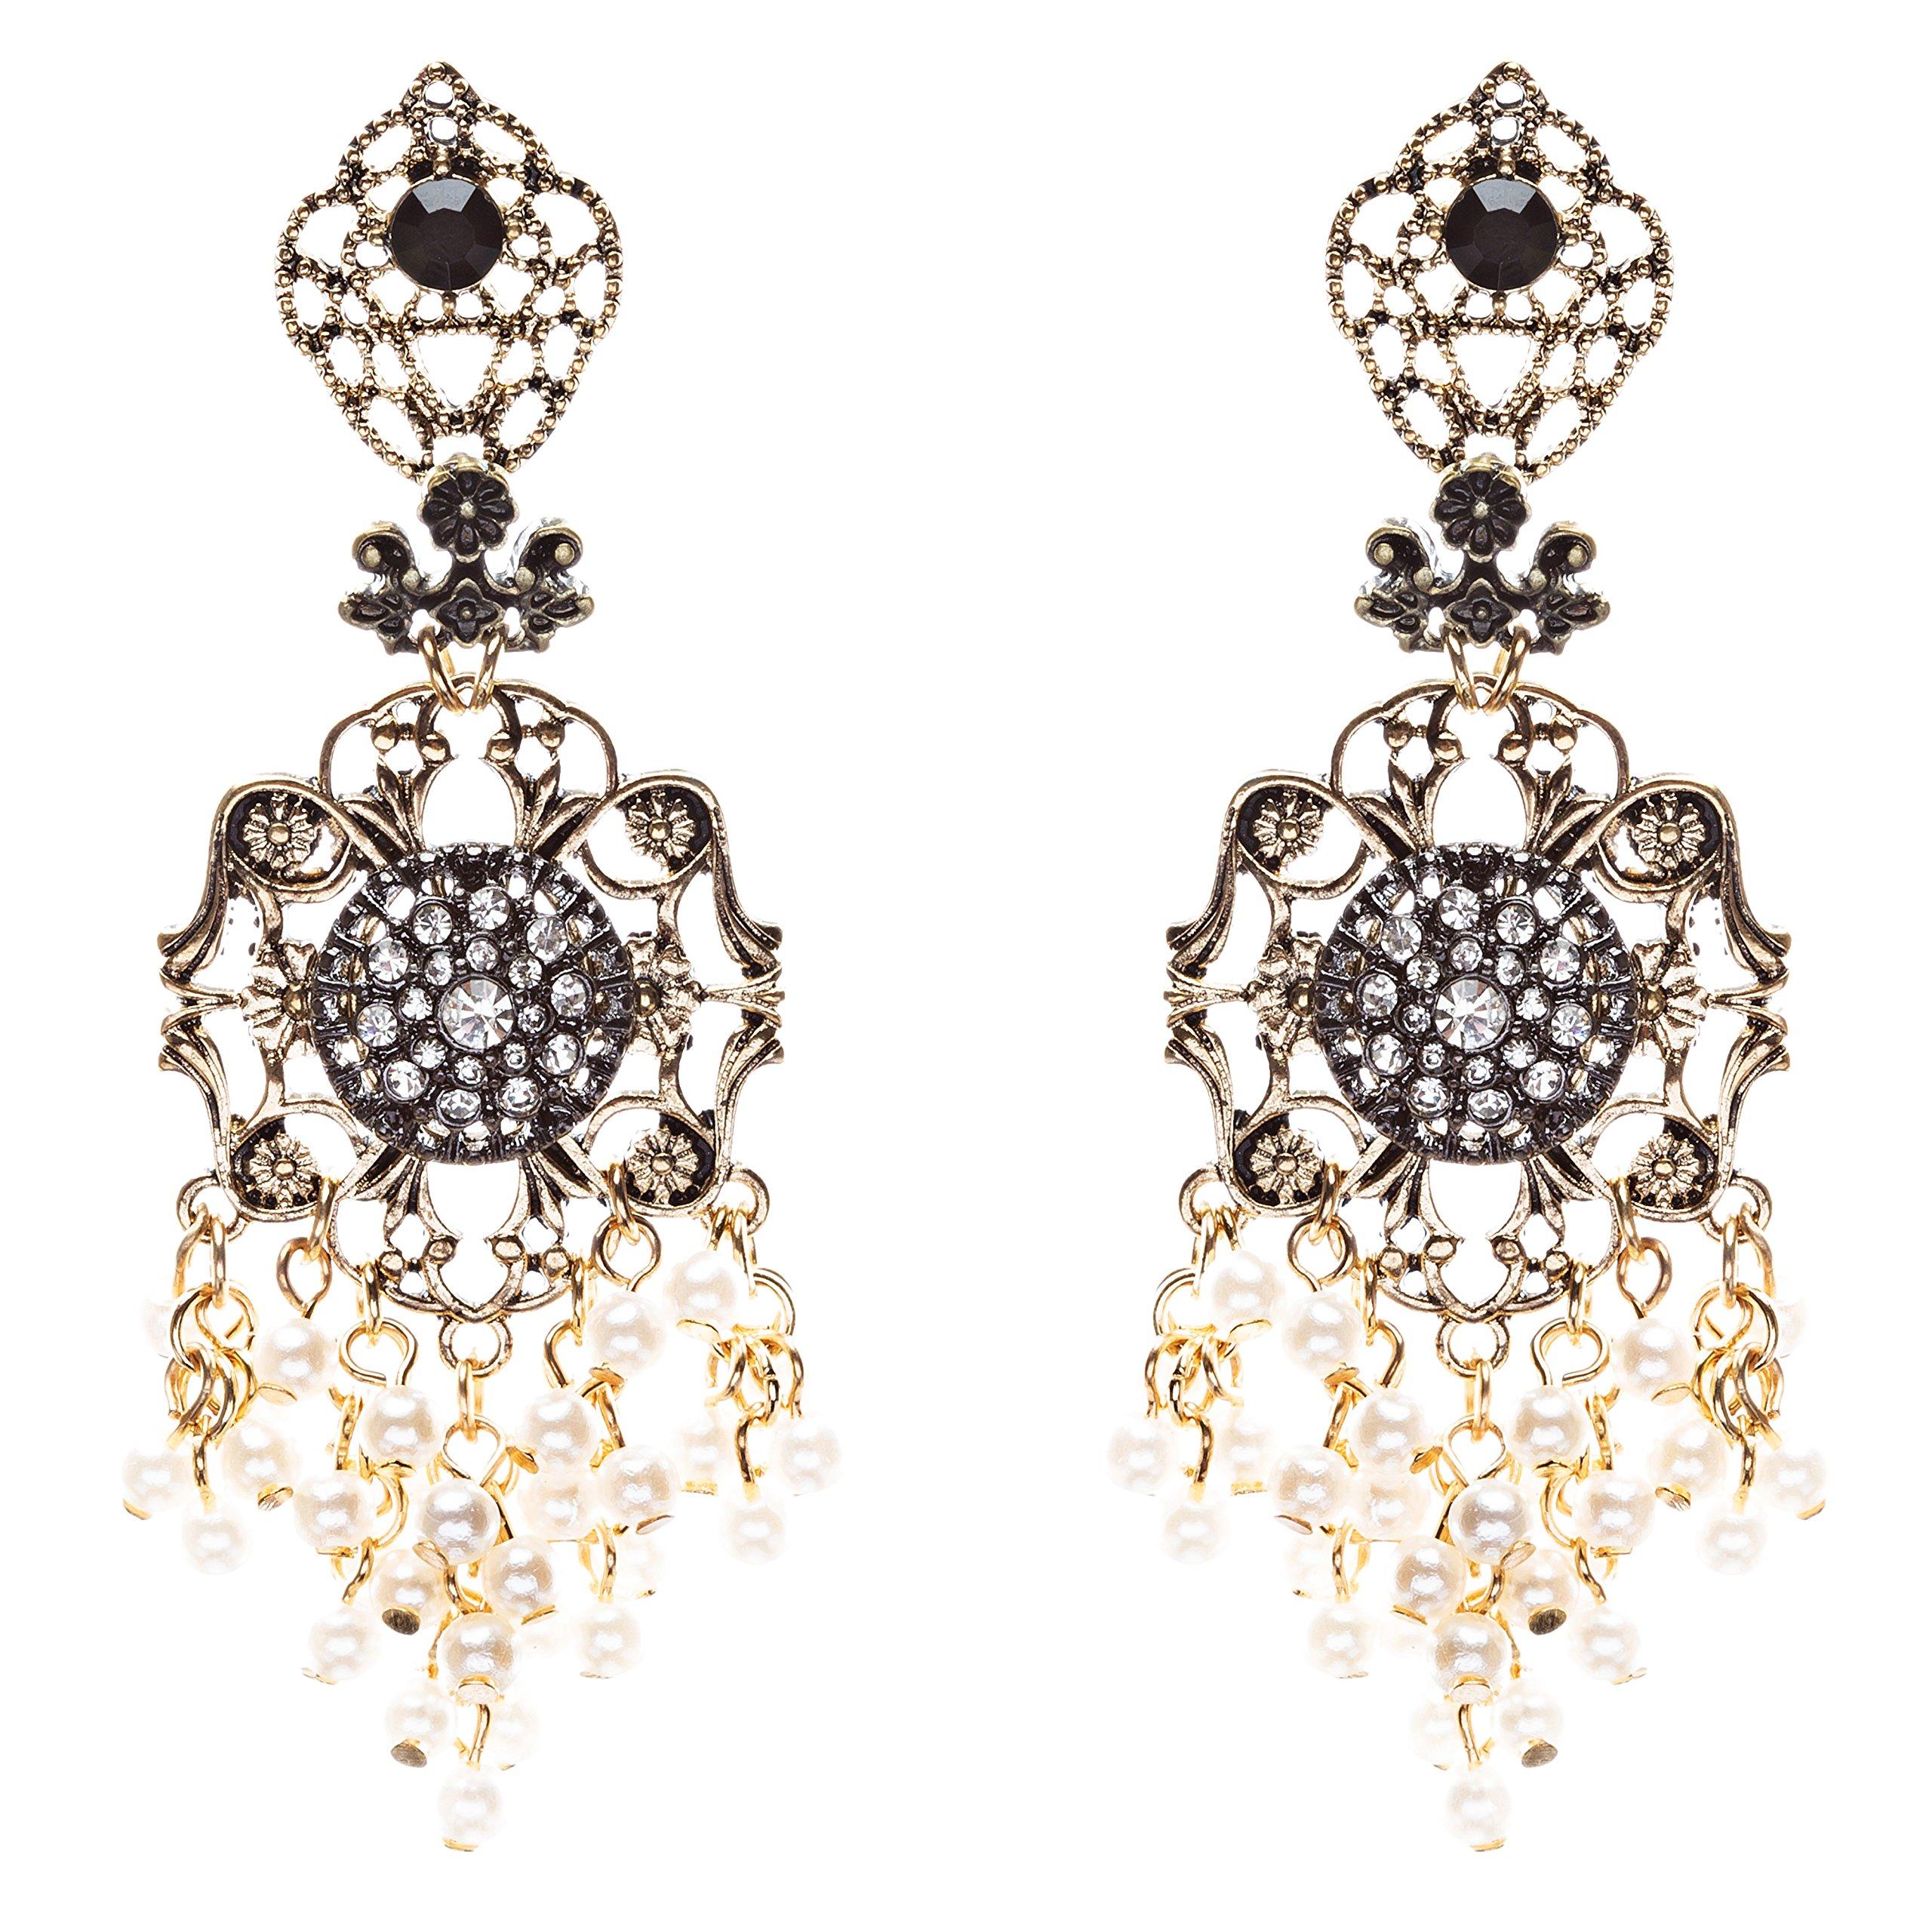 Elegance Fashion Crystal Rhinestone Beautifully Crafted Earrings E812 Cream